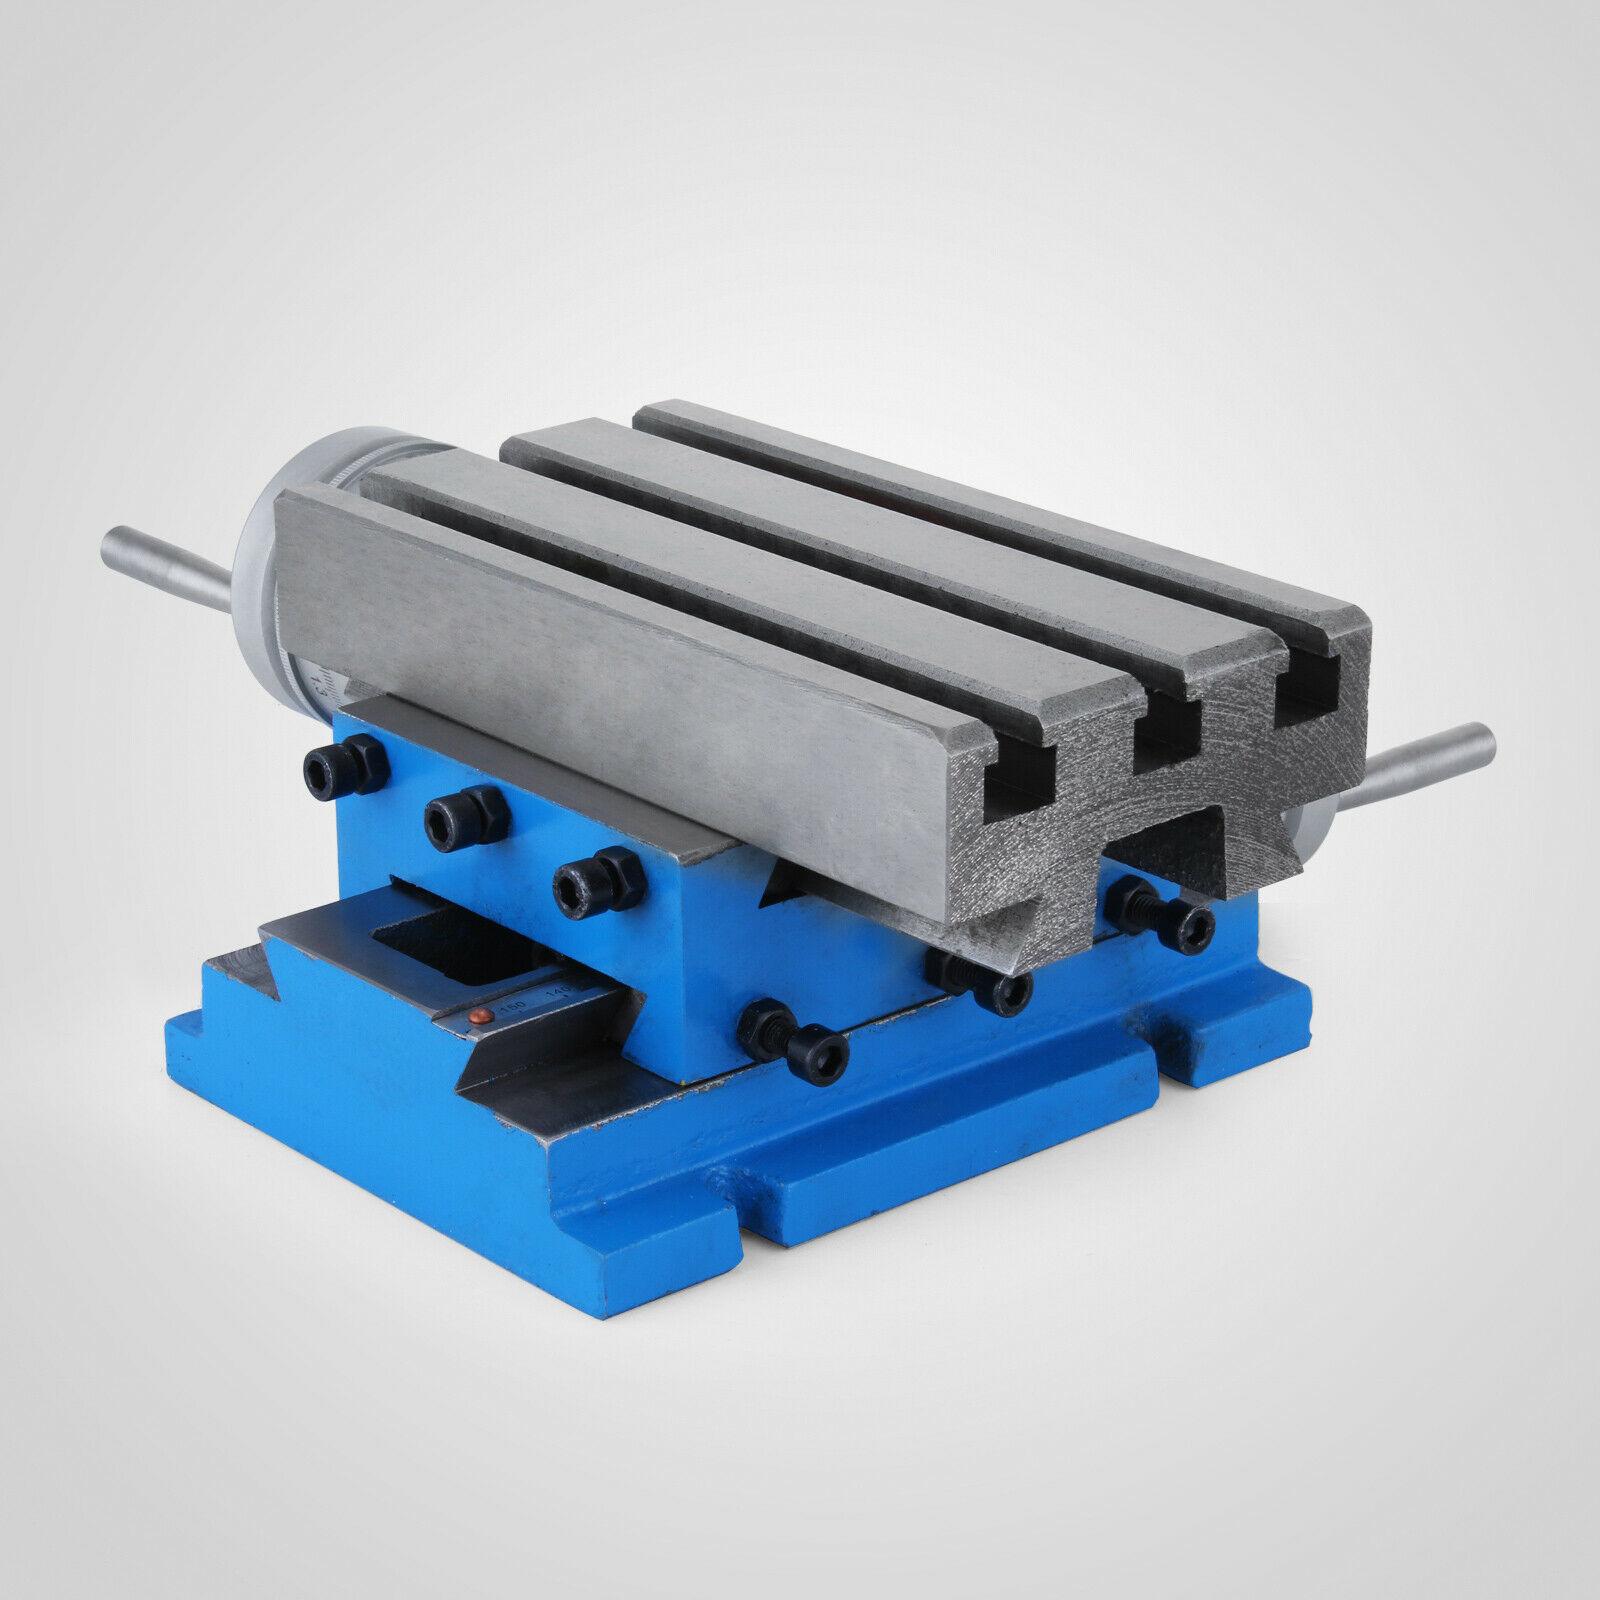 Milling Cross Worktable (7.3 x 4 Inch) Compound Slide Milling TablePrecision enlarge